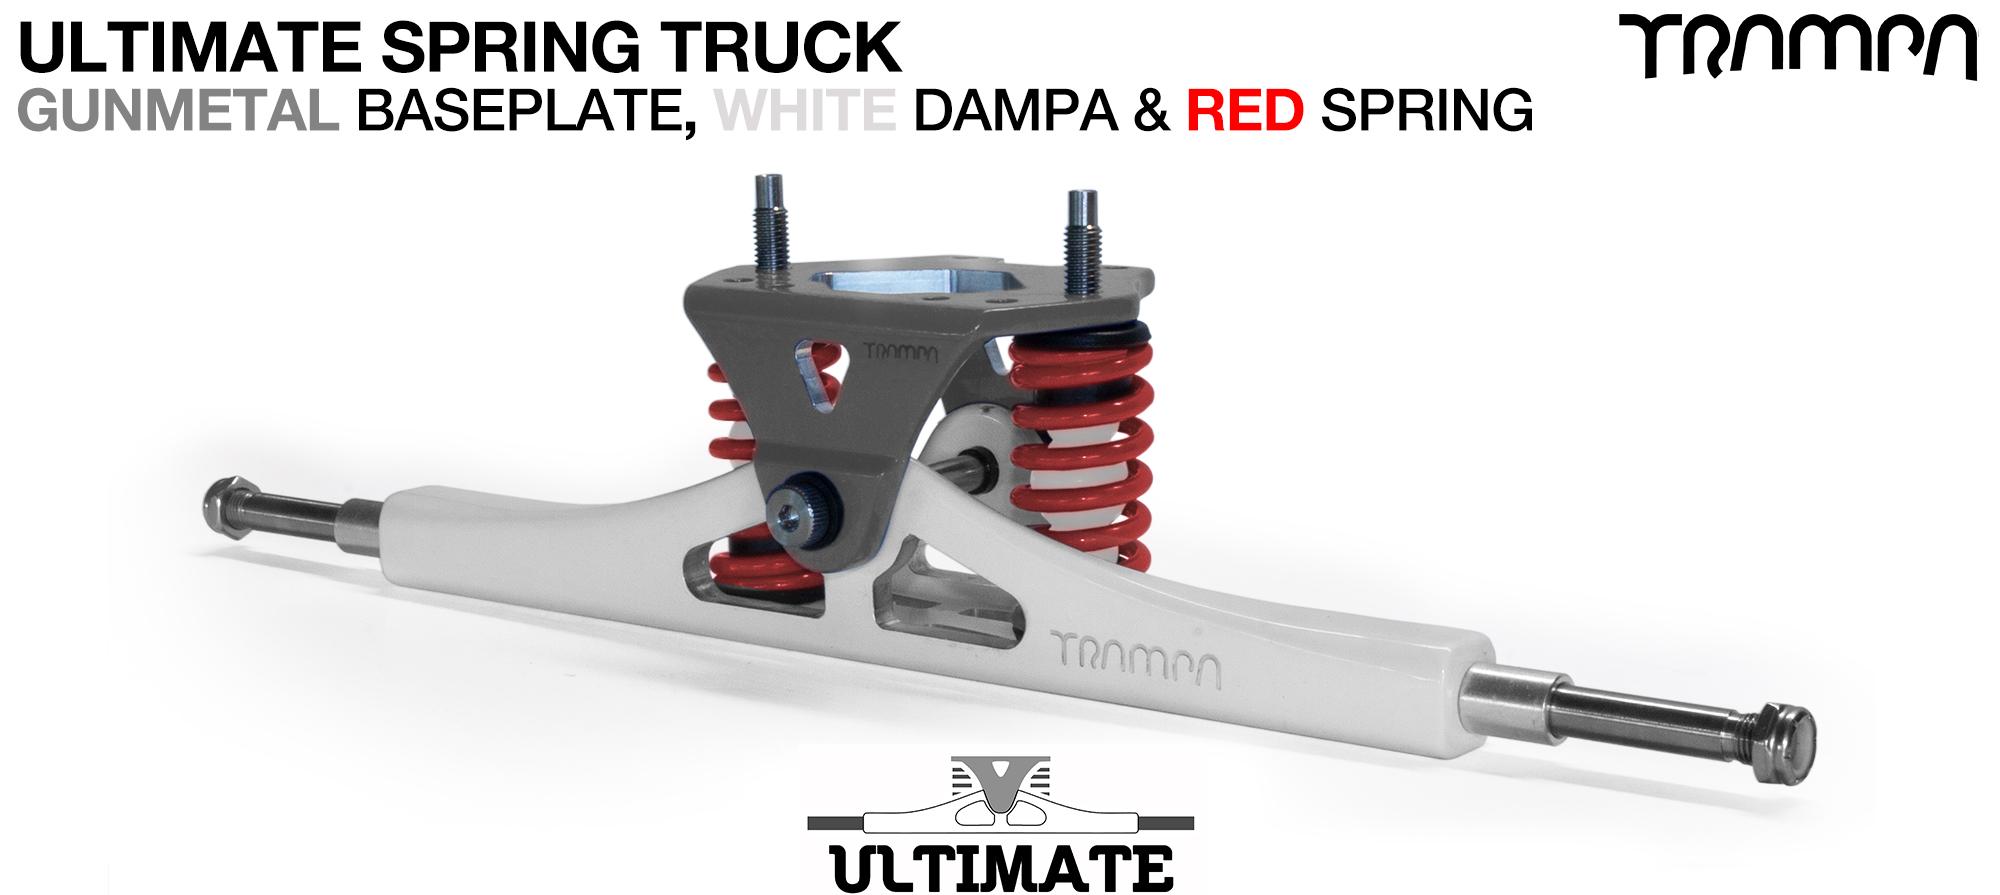 ULTIMATE ATB TRUCK - WHITE ATB Hanger with TITANIUM Axles & Kingpin & GUNMETAL Baseplate